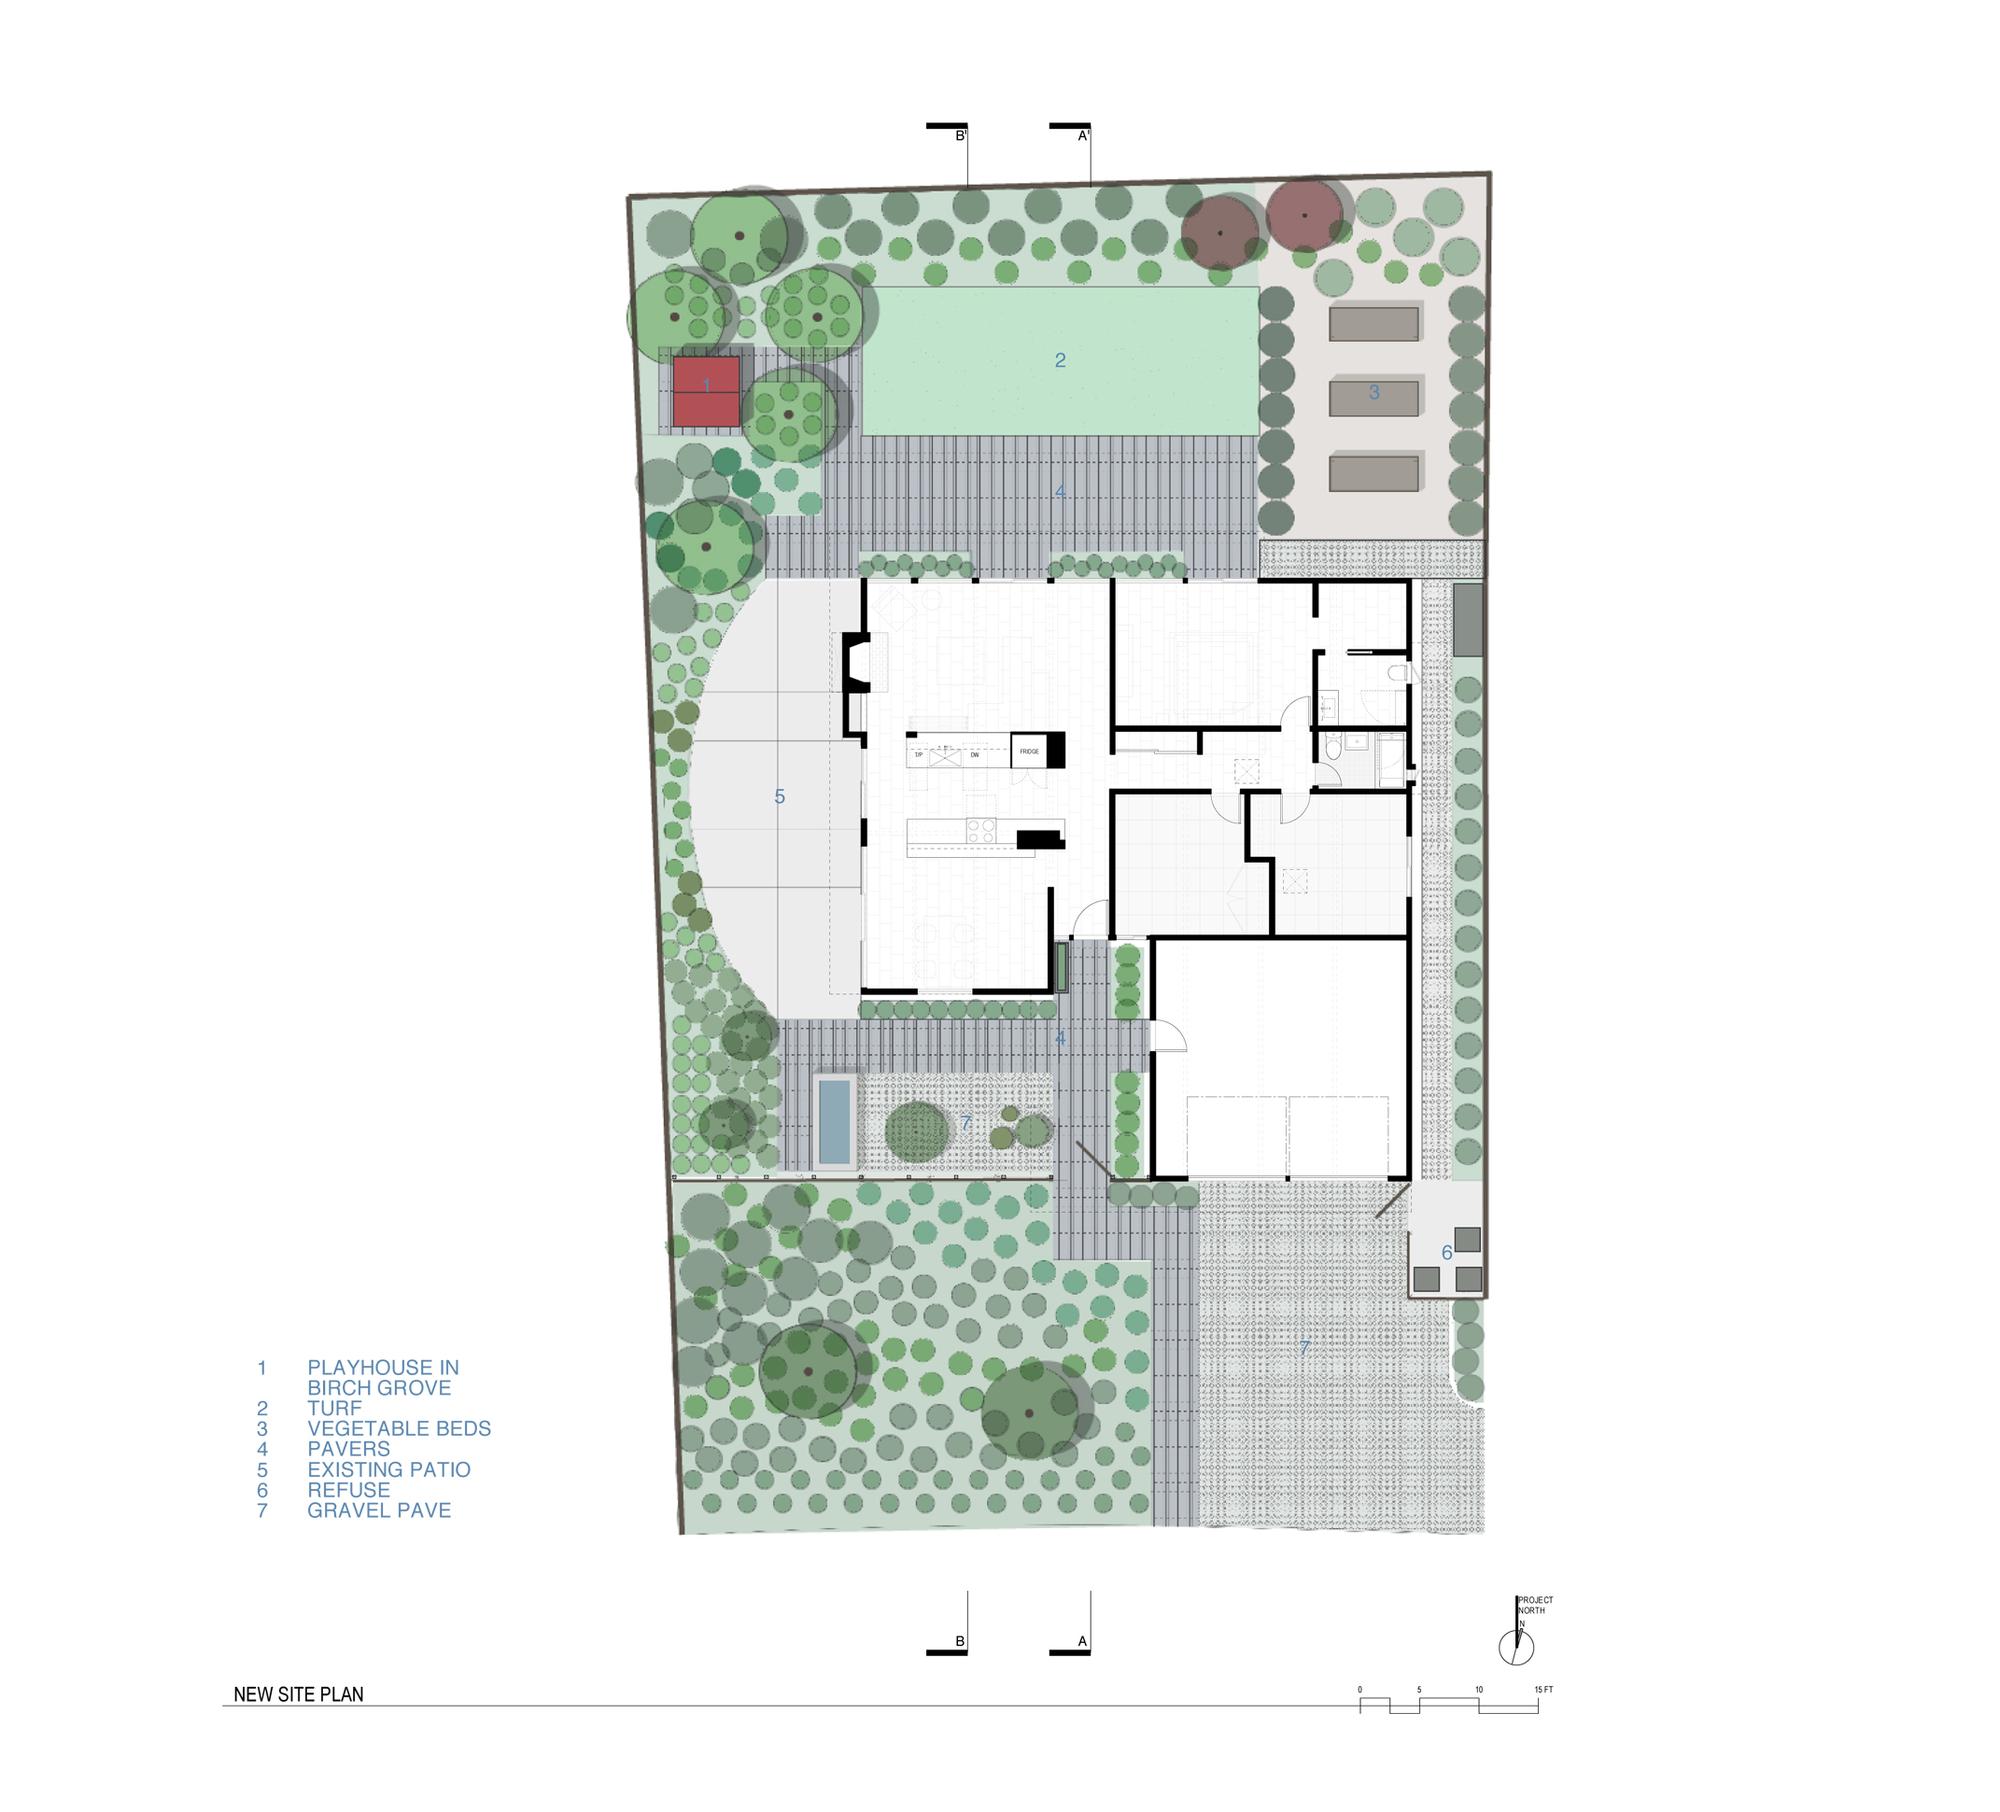 5306c8fec07a80c45f0000d5_shoup-residence-buildin-lab_shoup_siteplan